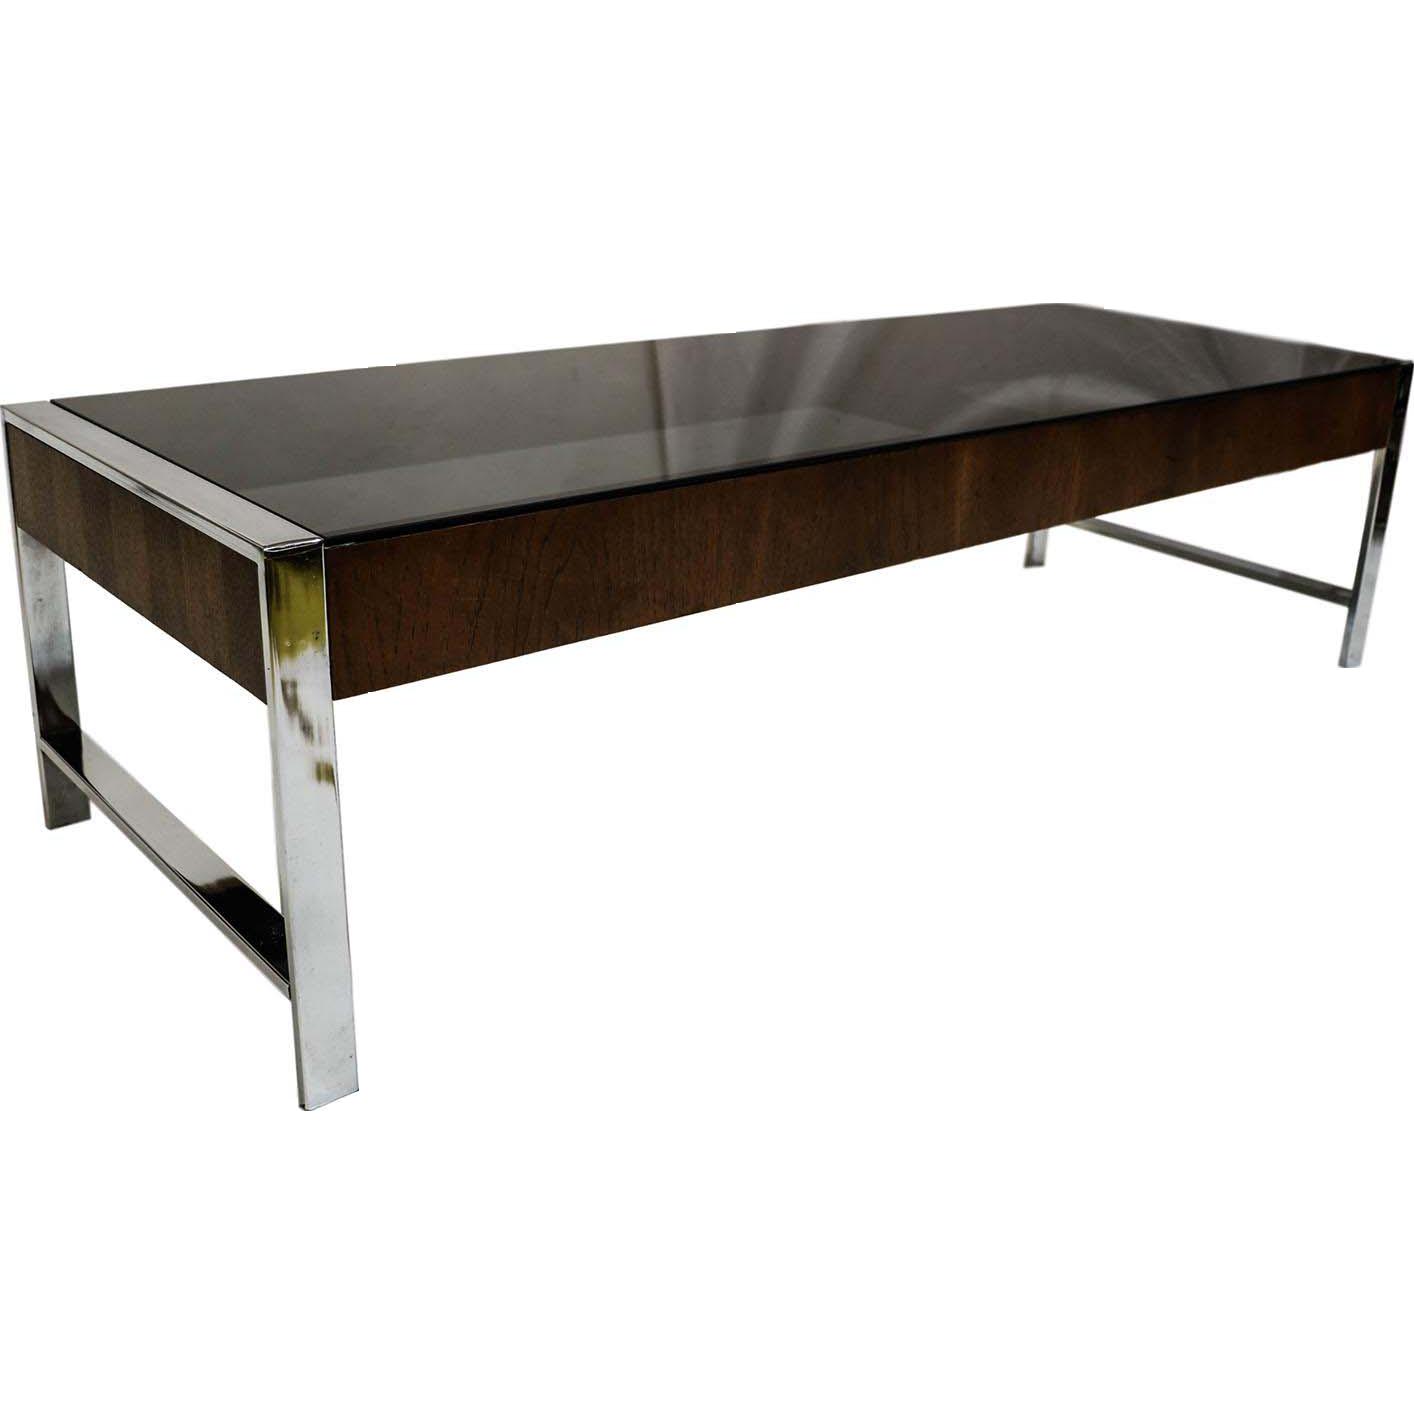 Milo Baughman Chrome Coffee Table: Mid Century Chrome Smoked Glass Coffee Table Milo Baughman